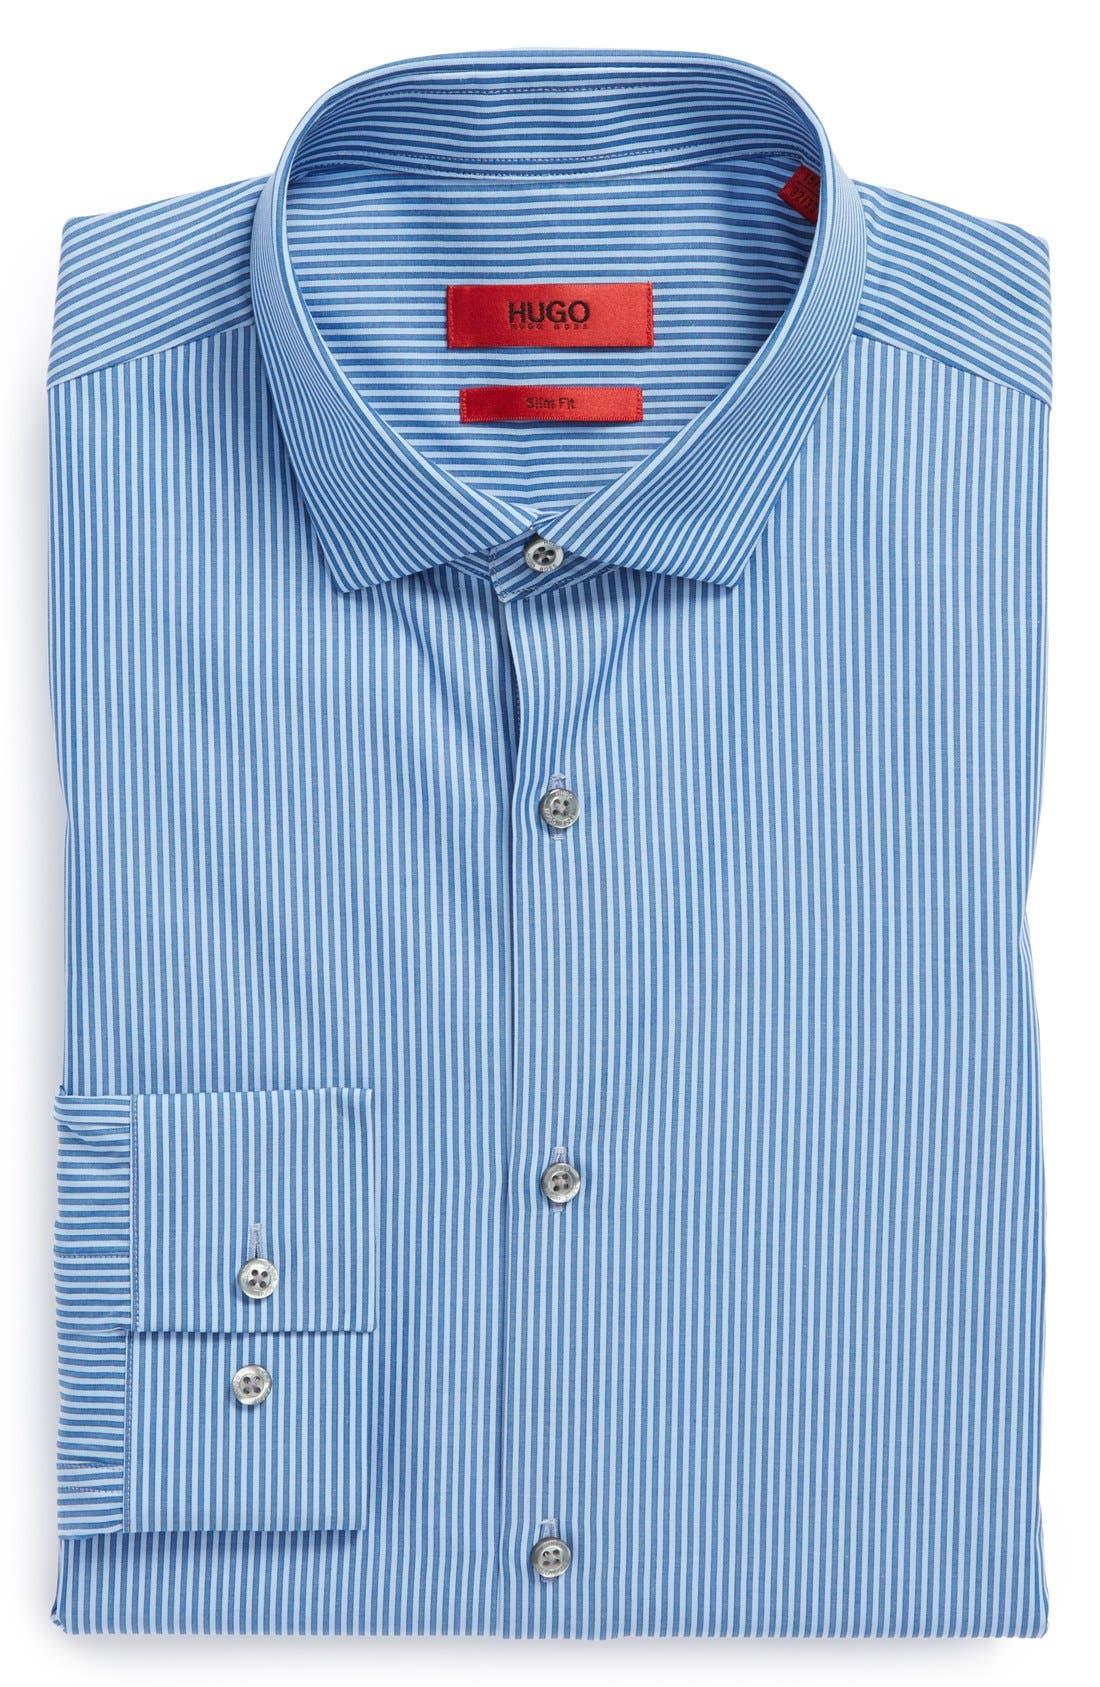 Main Image - HUGO BOSS EXTRIM DRESS SHIRT